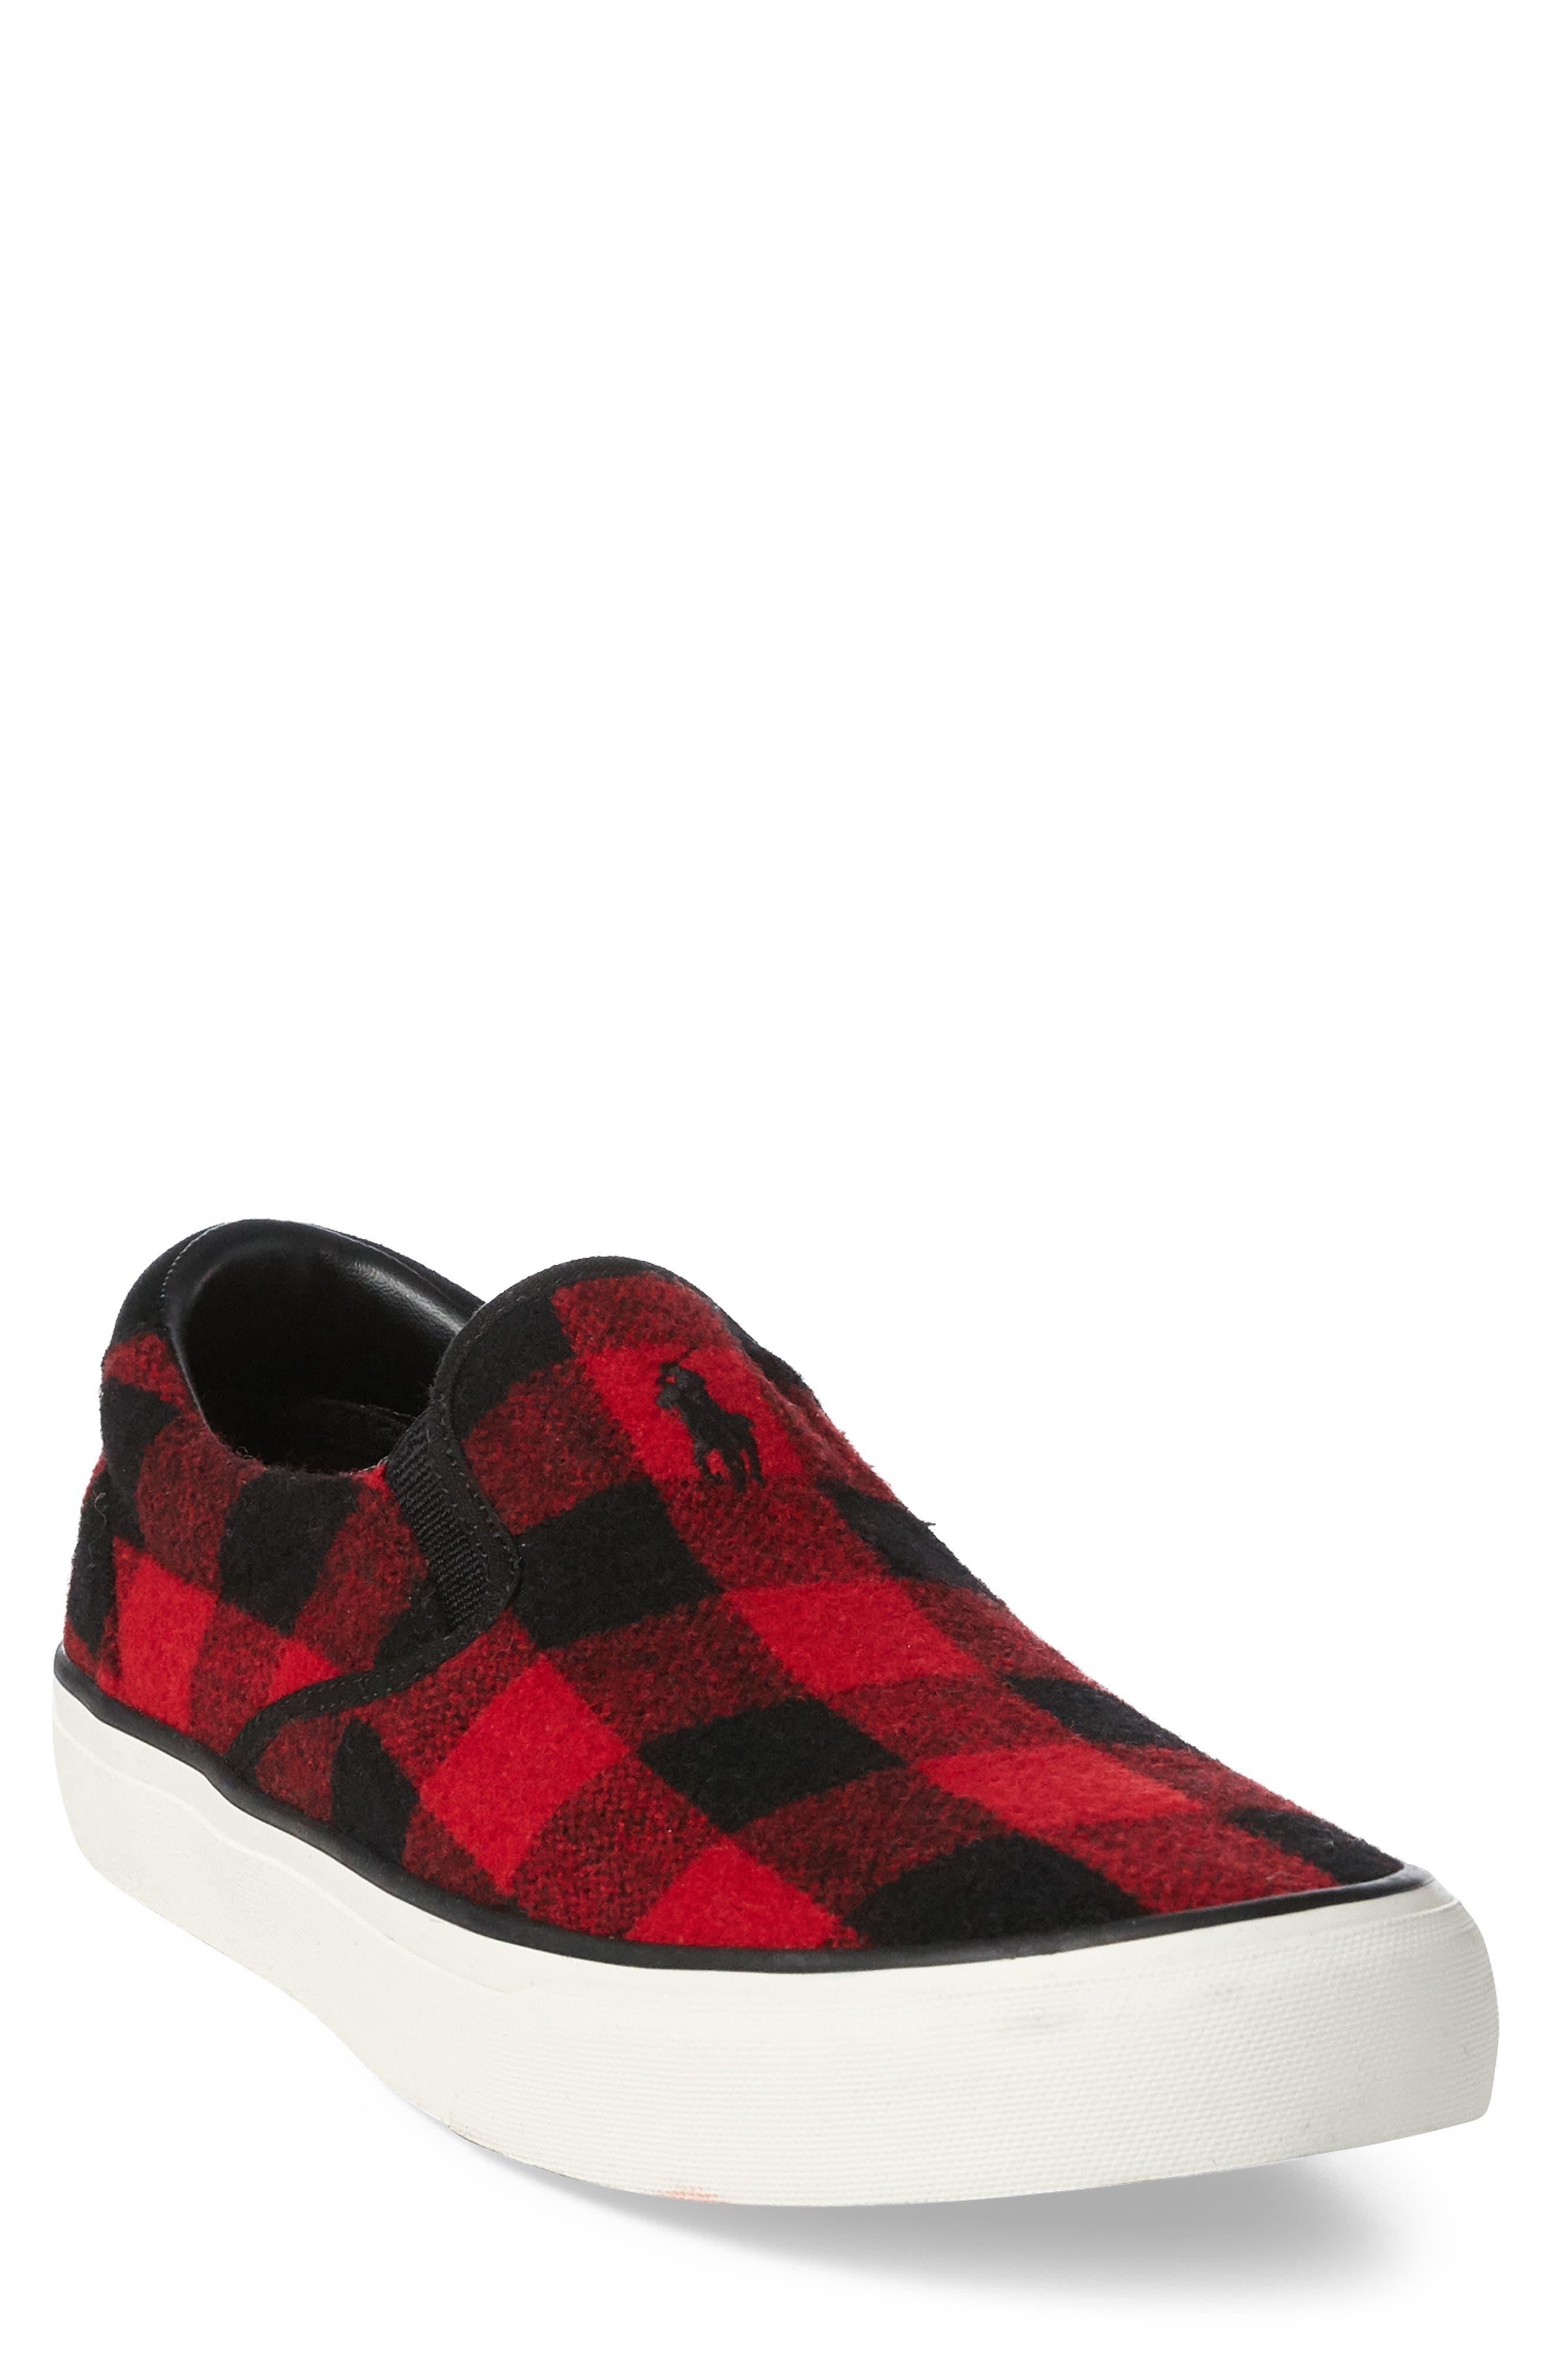 Thompson Wool Slip-On Sneaker,                         Main,                         color, BLACK / RED